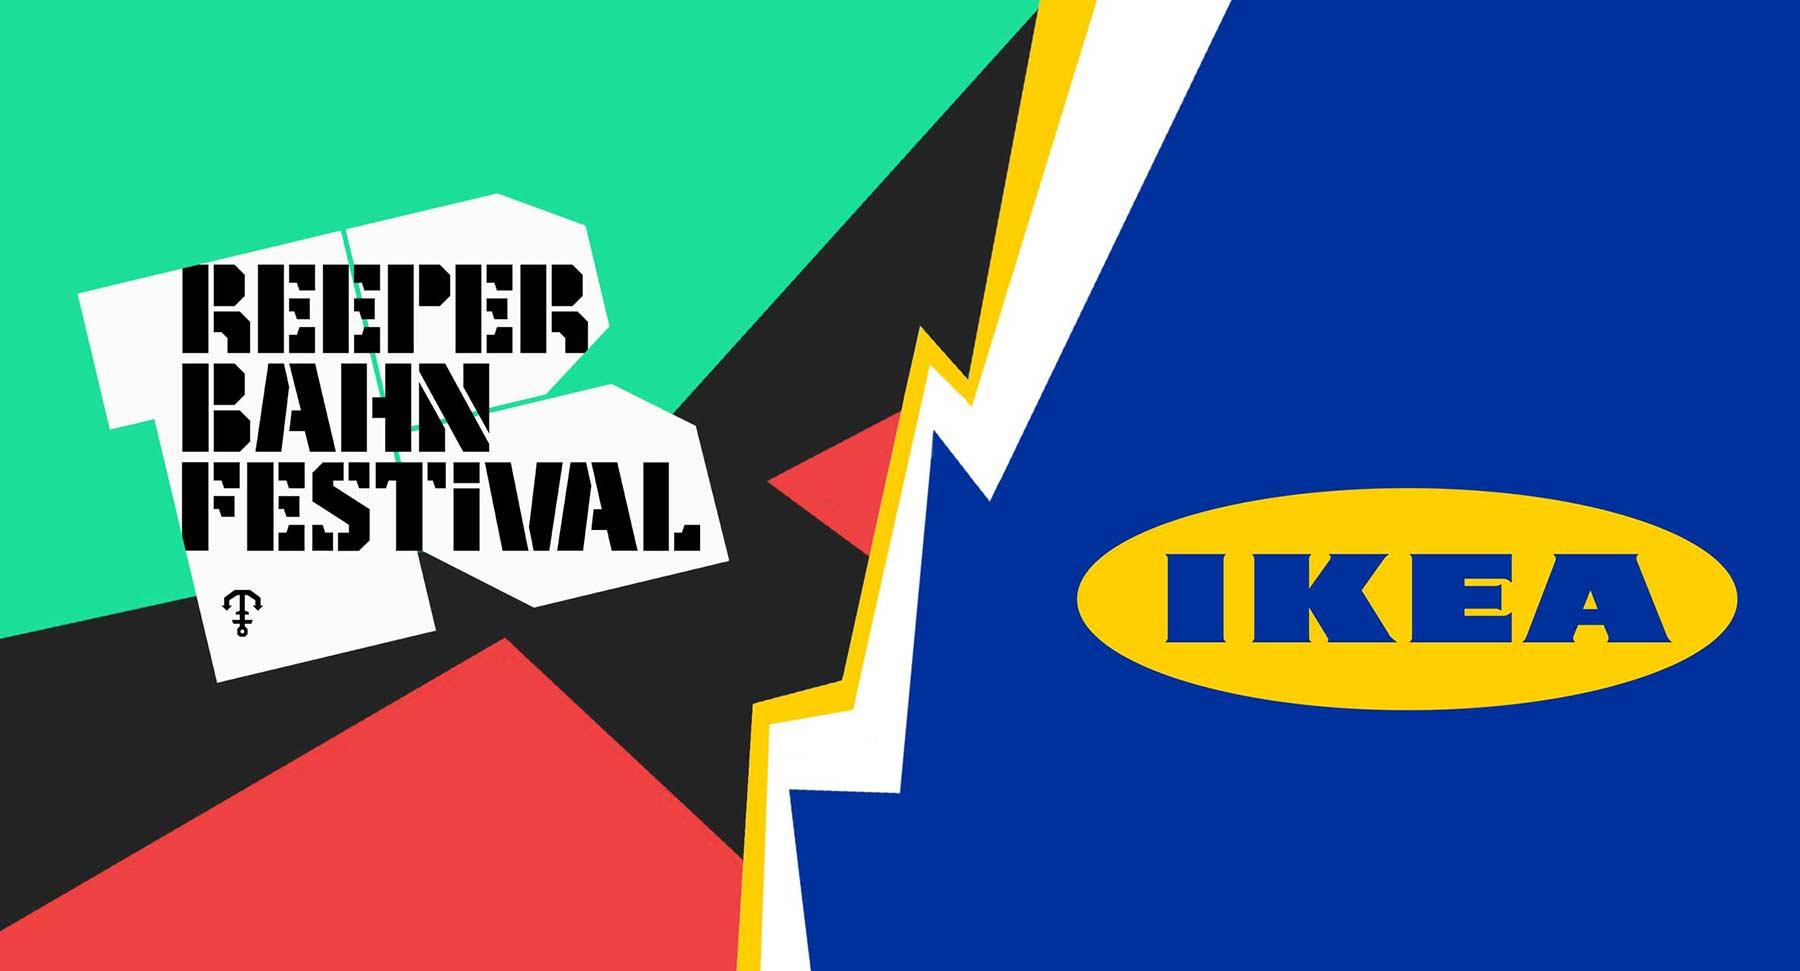 Quiz: Reeperbahn Festival-Act oder IKEA-Produkt? reeperbahn-oder-IKEA